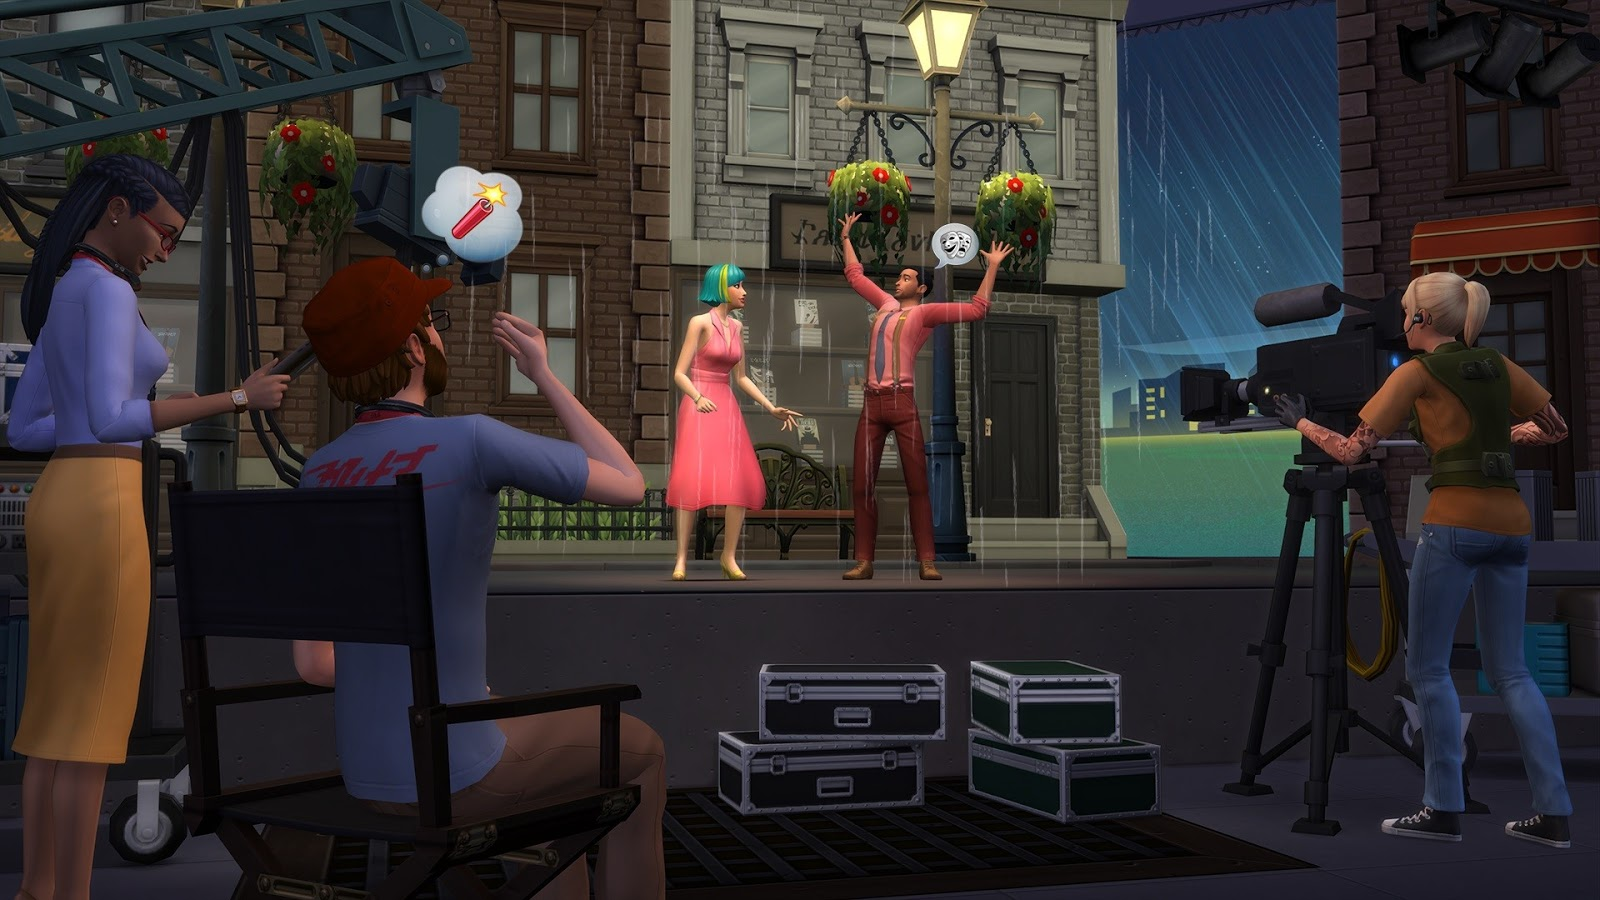 Los Sims 4 Rumbo A La Fama PC ESPAÑOL + Updates (CODEX) 2